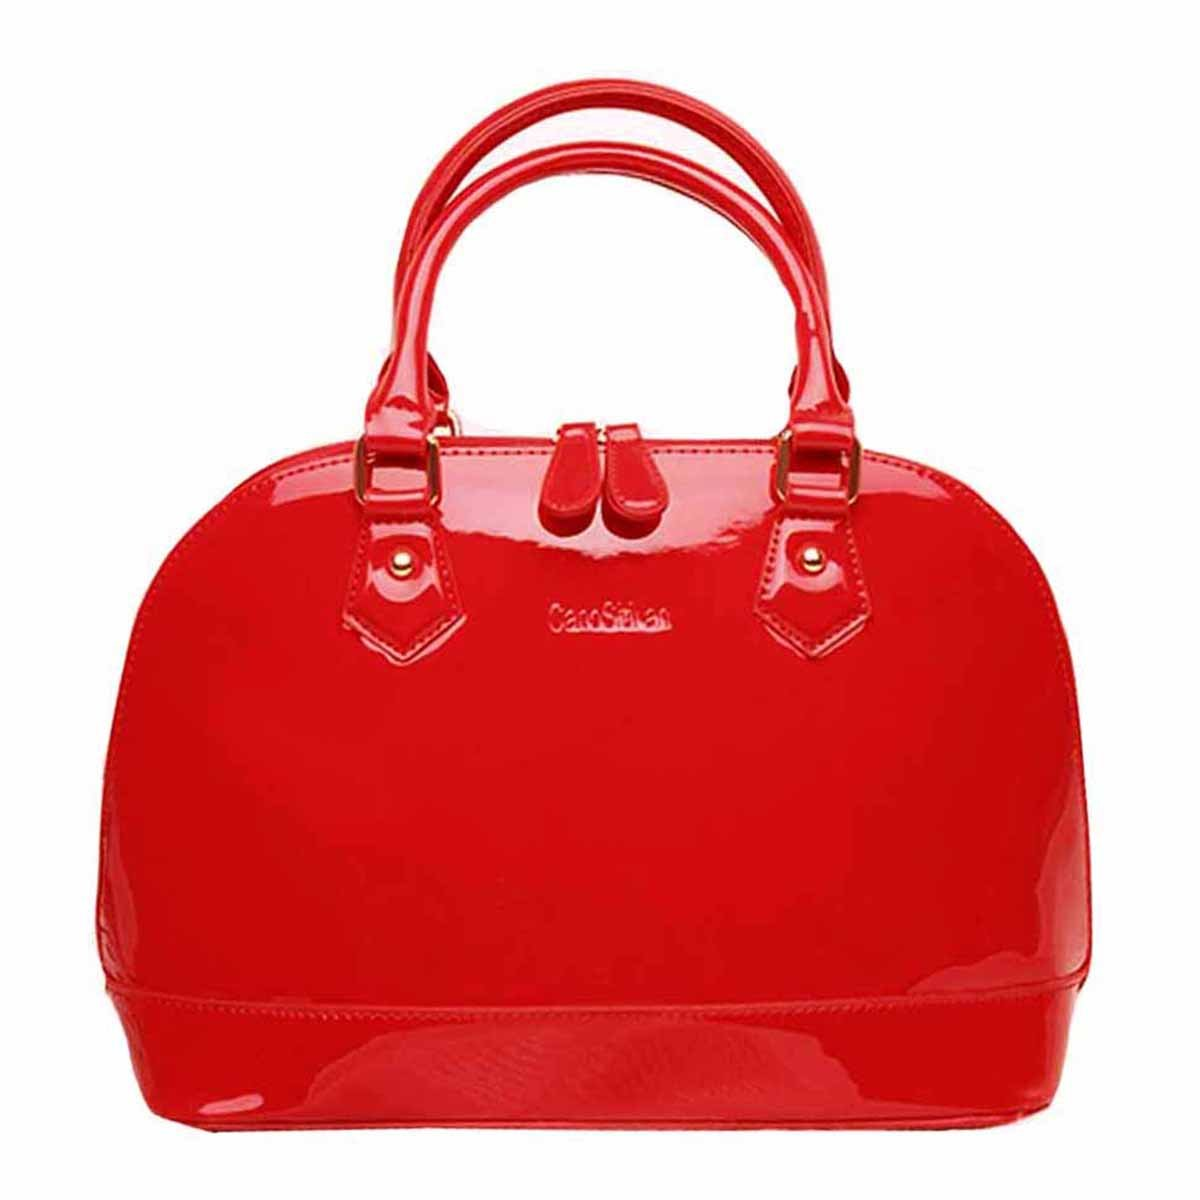 Danse Jupe Women Shiny Patent Leather Tote Handbag Dome Crossbody Bag Wedding Clutch Purse, Red